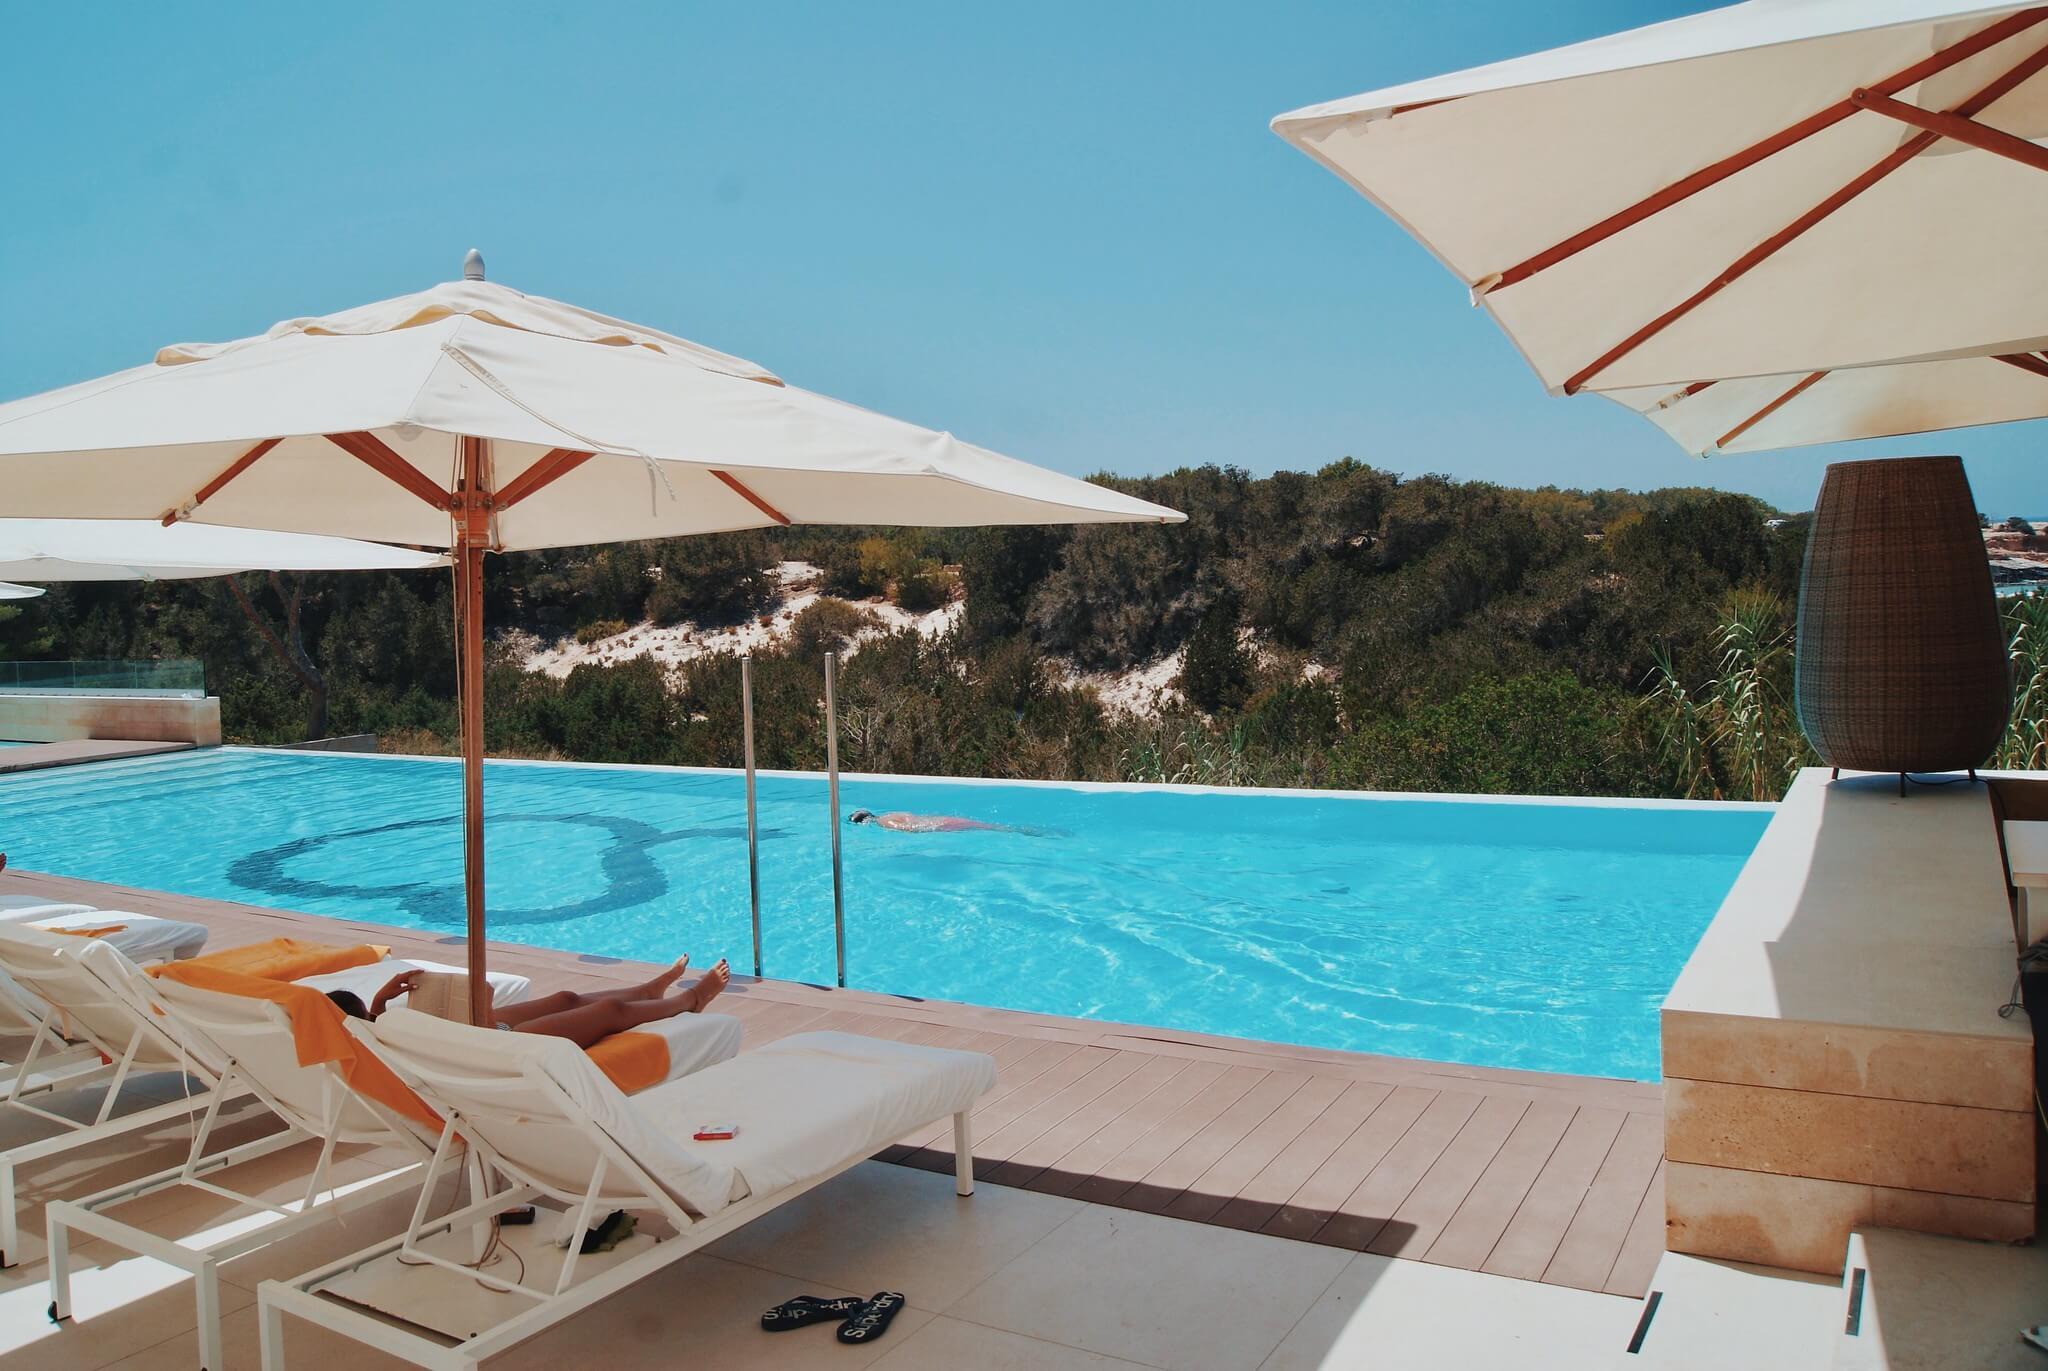 https://www.white-ibiza.com/wp-content/uploads/2020/03/formentera-hotels-cala-saona-2020-03.jpg